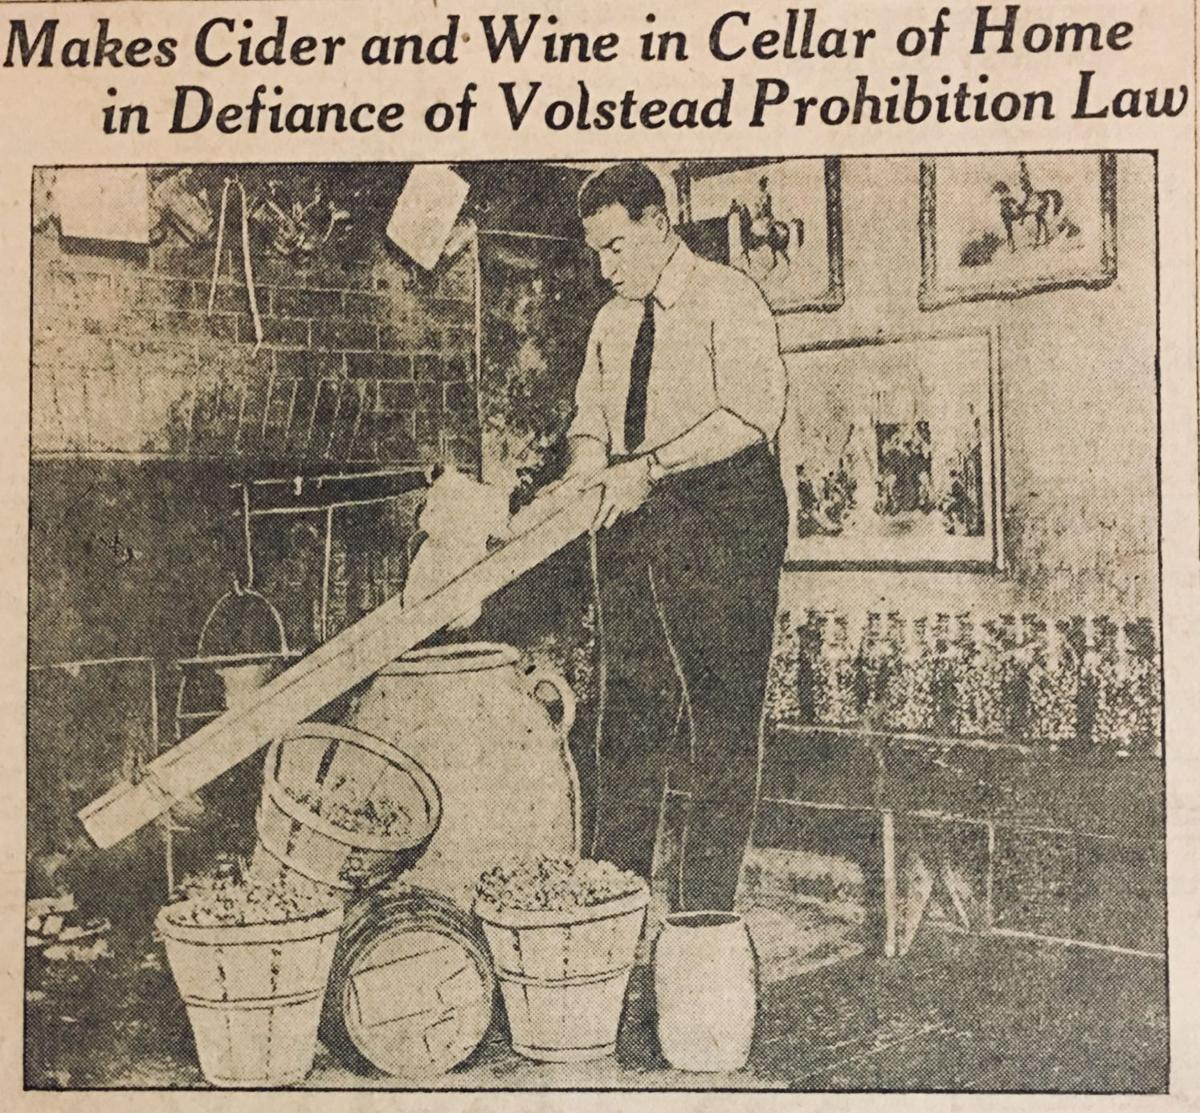 NOLA DNA - Makes Cider And Wine.jpg